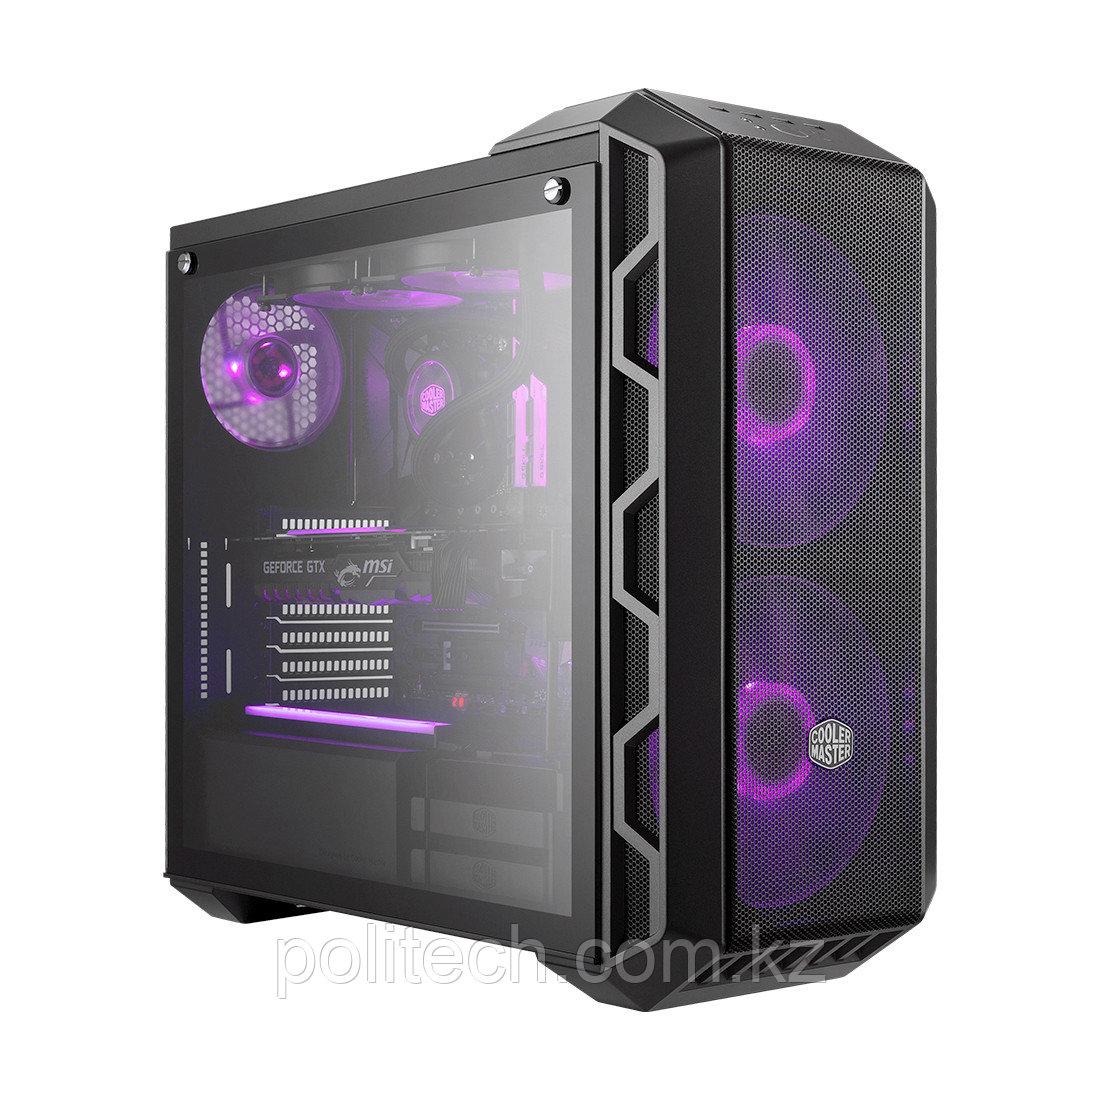 Компьютерный корпус Cooler Master MasterCase H500 Iron Grey без Б/П